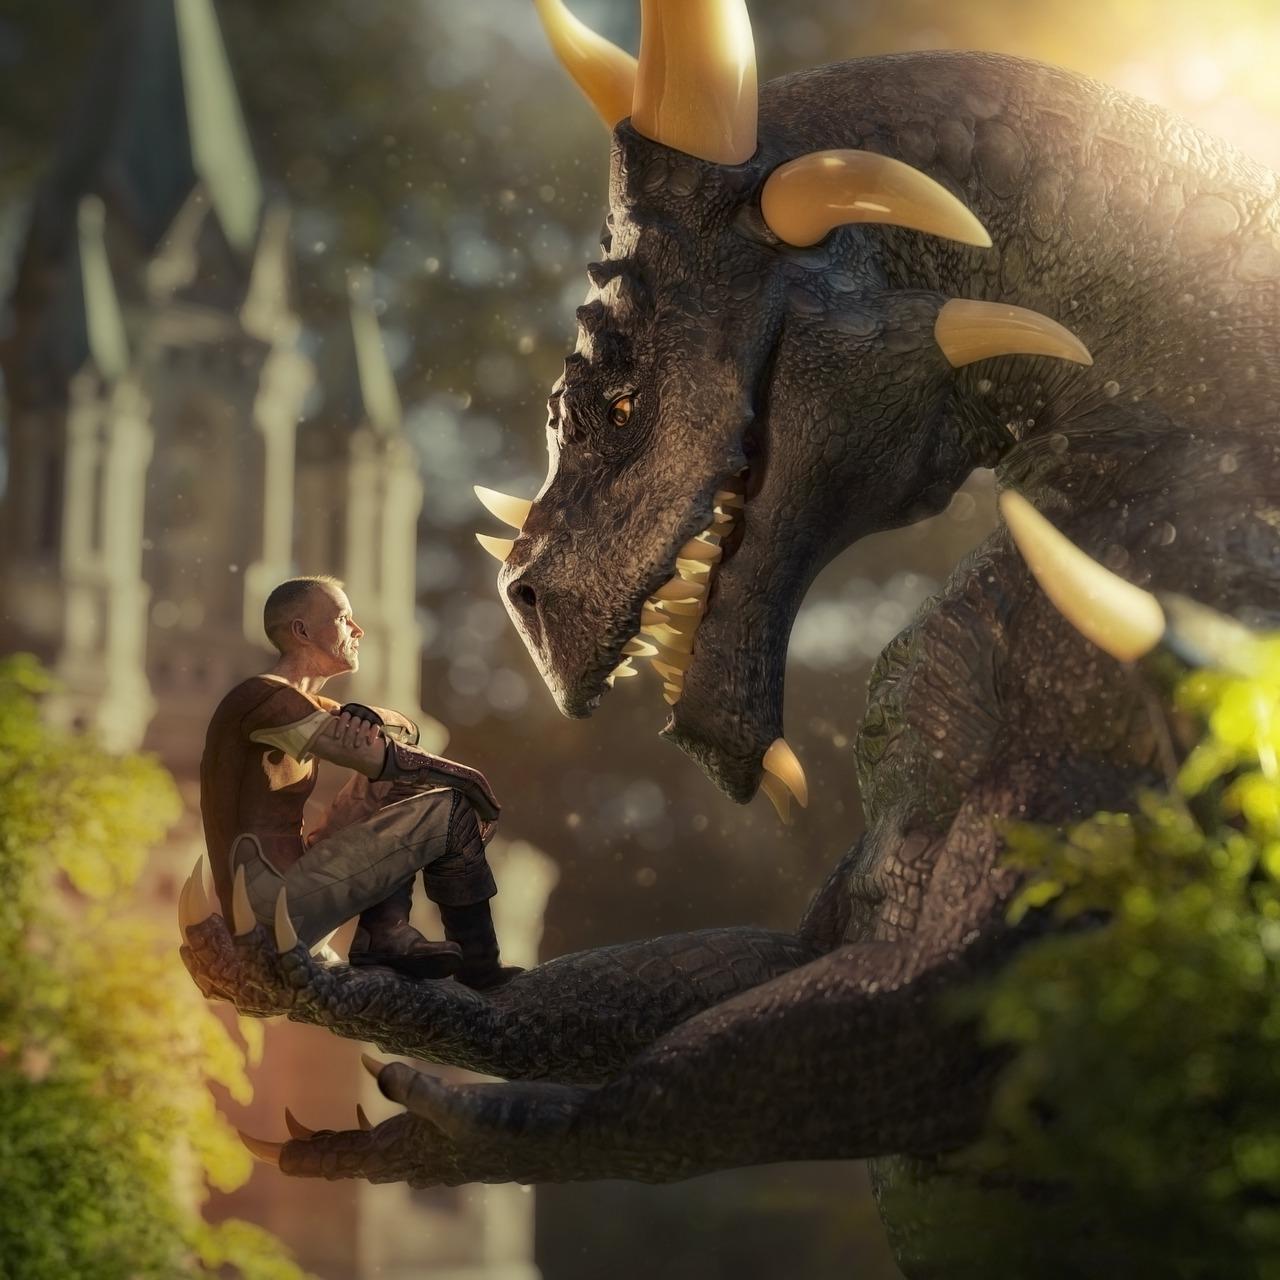 fantasy, dragon, fairytale